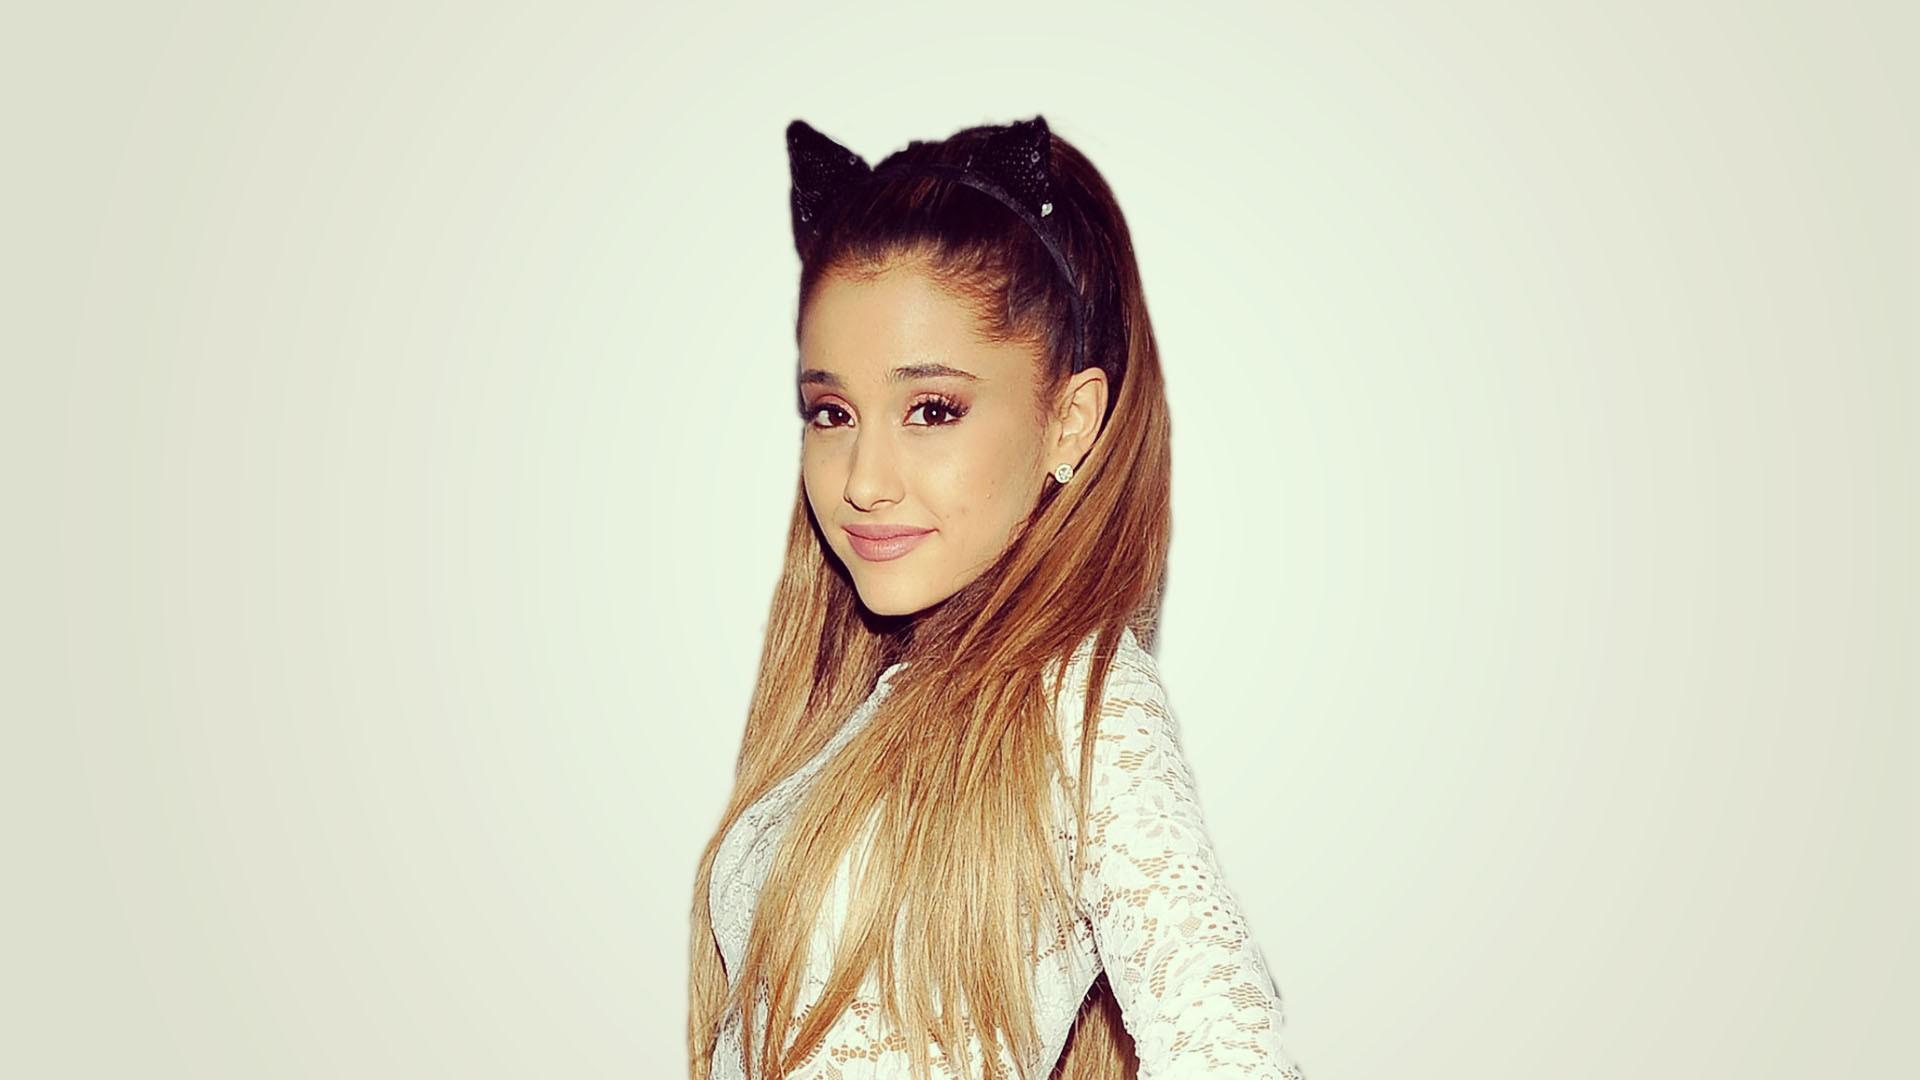 Cool Wallpaper Music Portrait - model-portrait-long-hair-photography-music-singer-dress-black-hair-fashion-hair-Ariana-Grande-spring-supermodel-girl-beauty-blond-hairstyle-1920x1080-px-portrait-photography-photo-shoot-brown-hair-525231  2018_895677.jpg